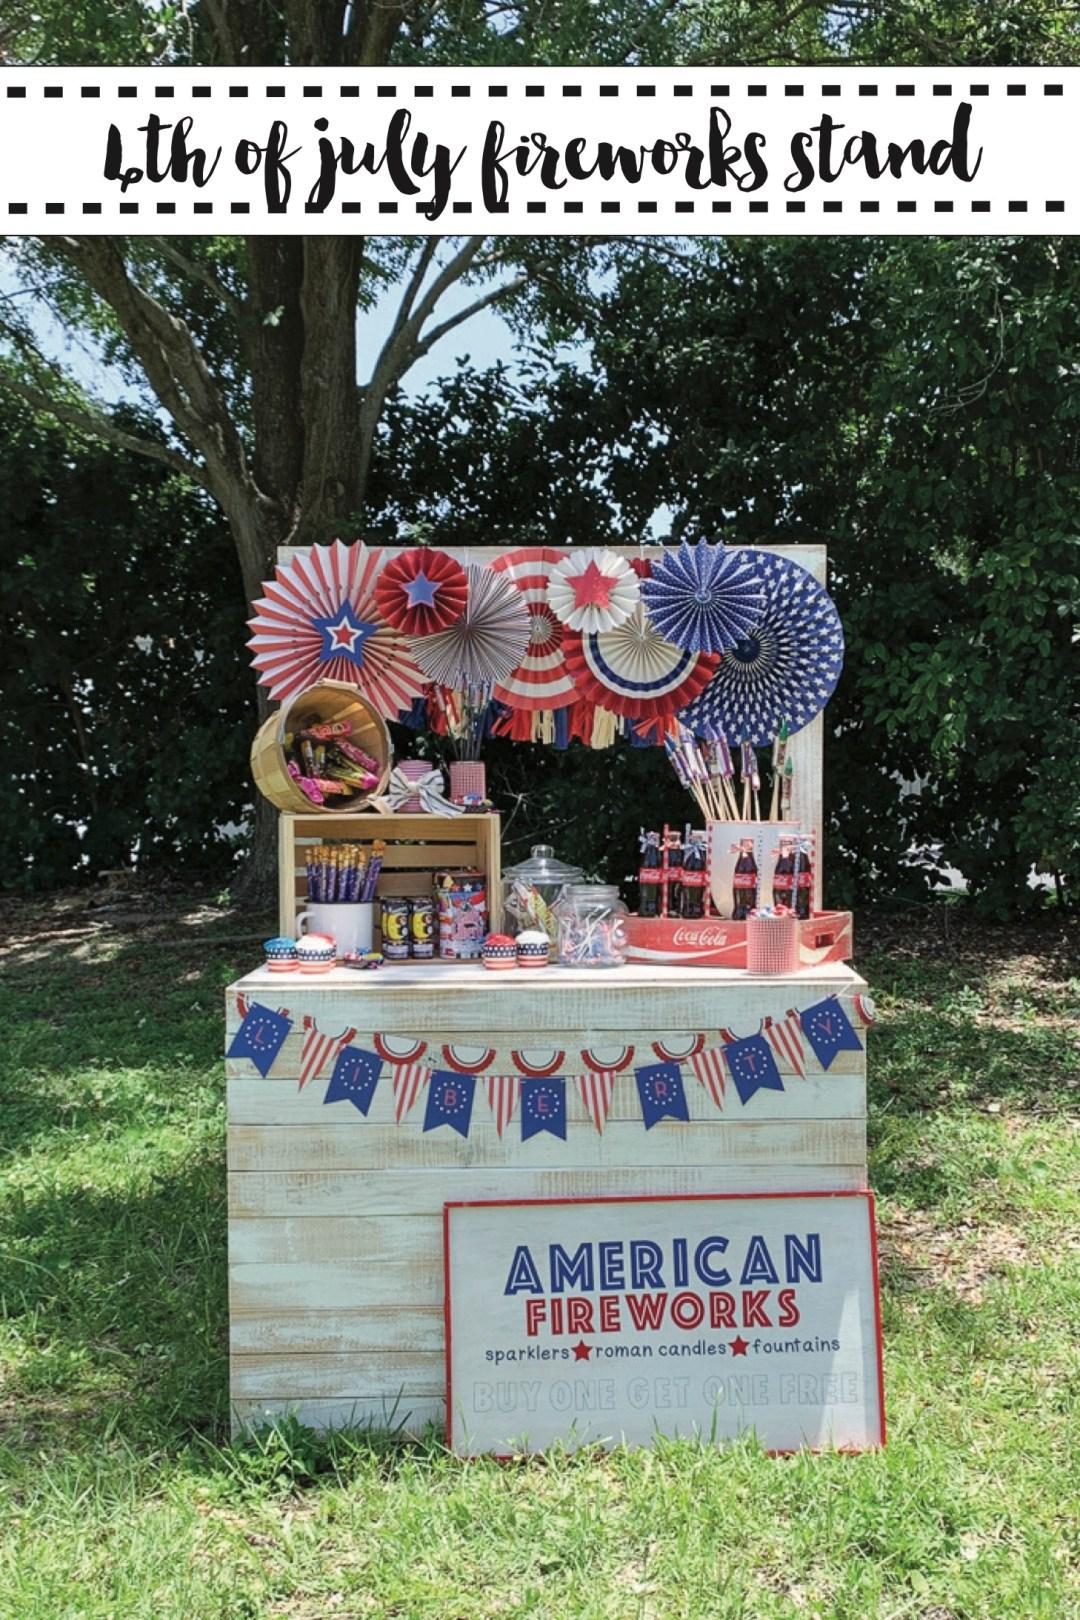 Vintage Patriotic Fireworks Stand